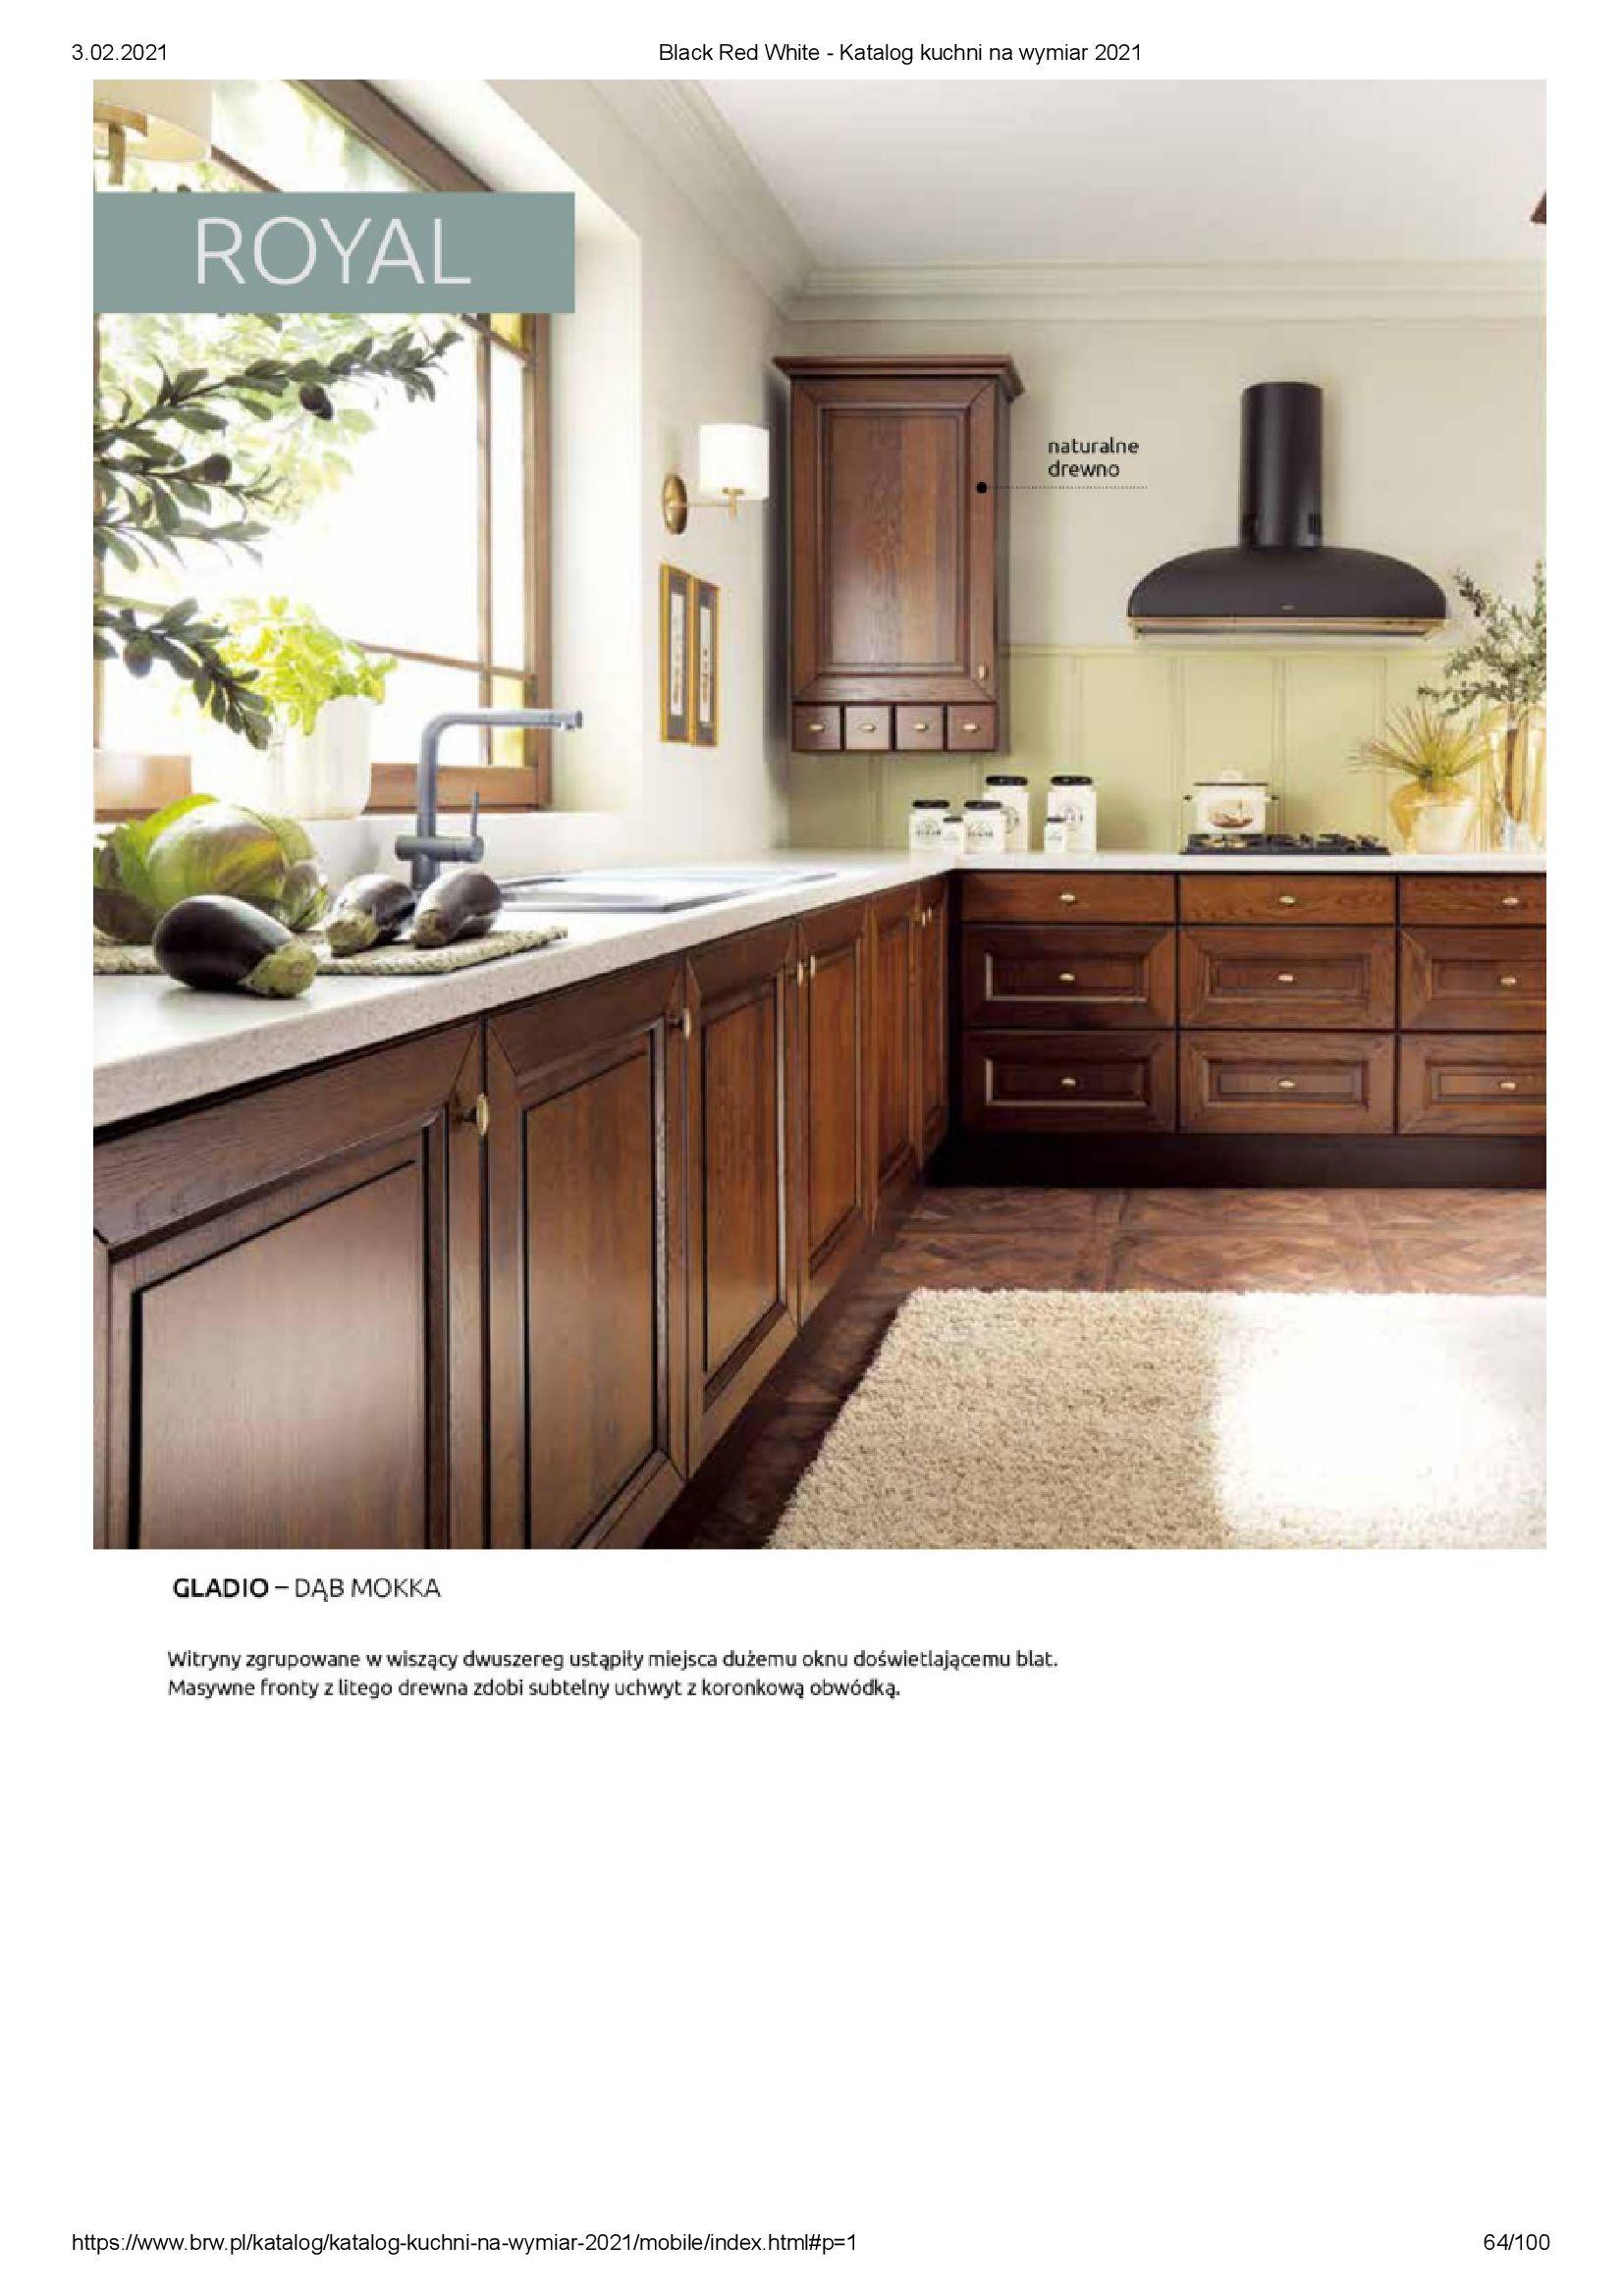 Gazetka Black Red White: Katalog - Kuchnie na wymiar Senso Kitchens 2021 2021-01-01 page-64